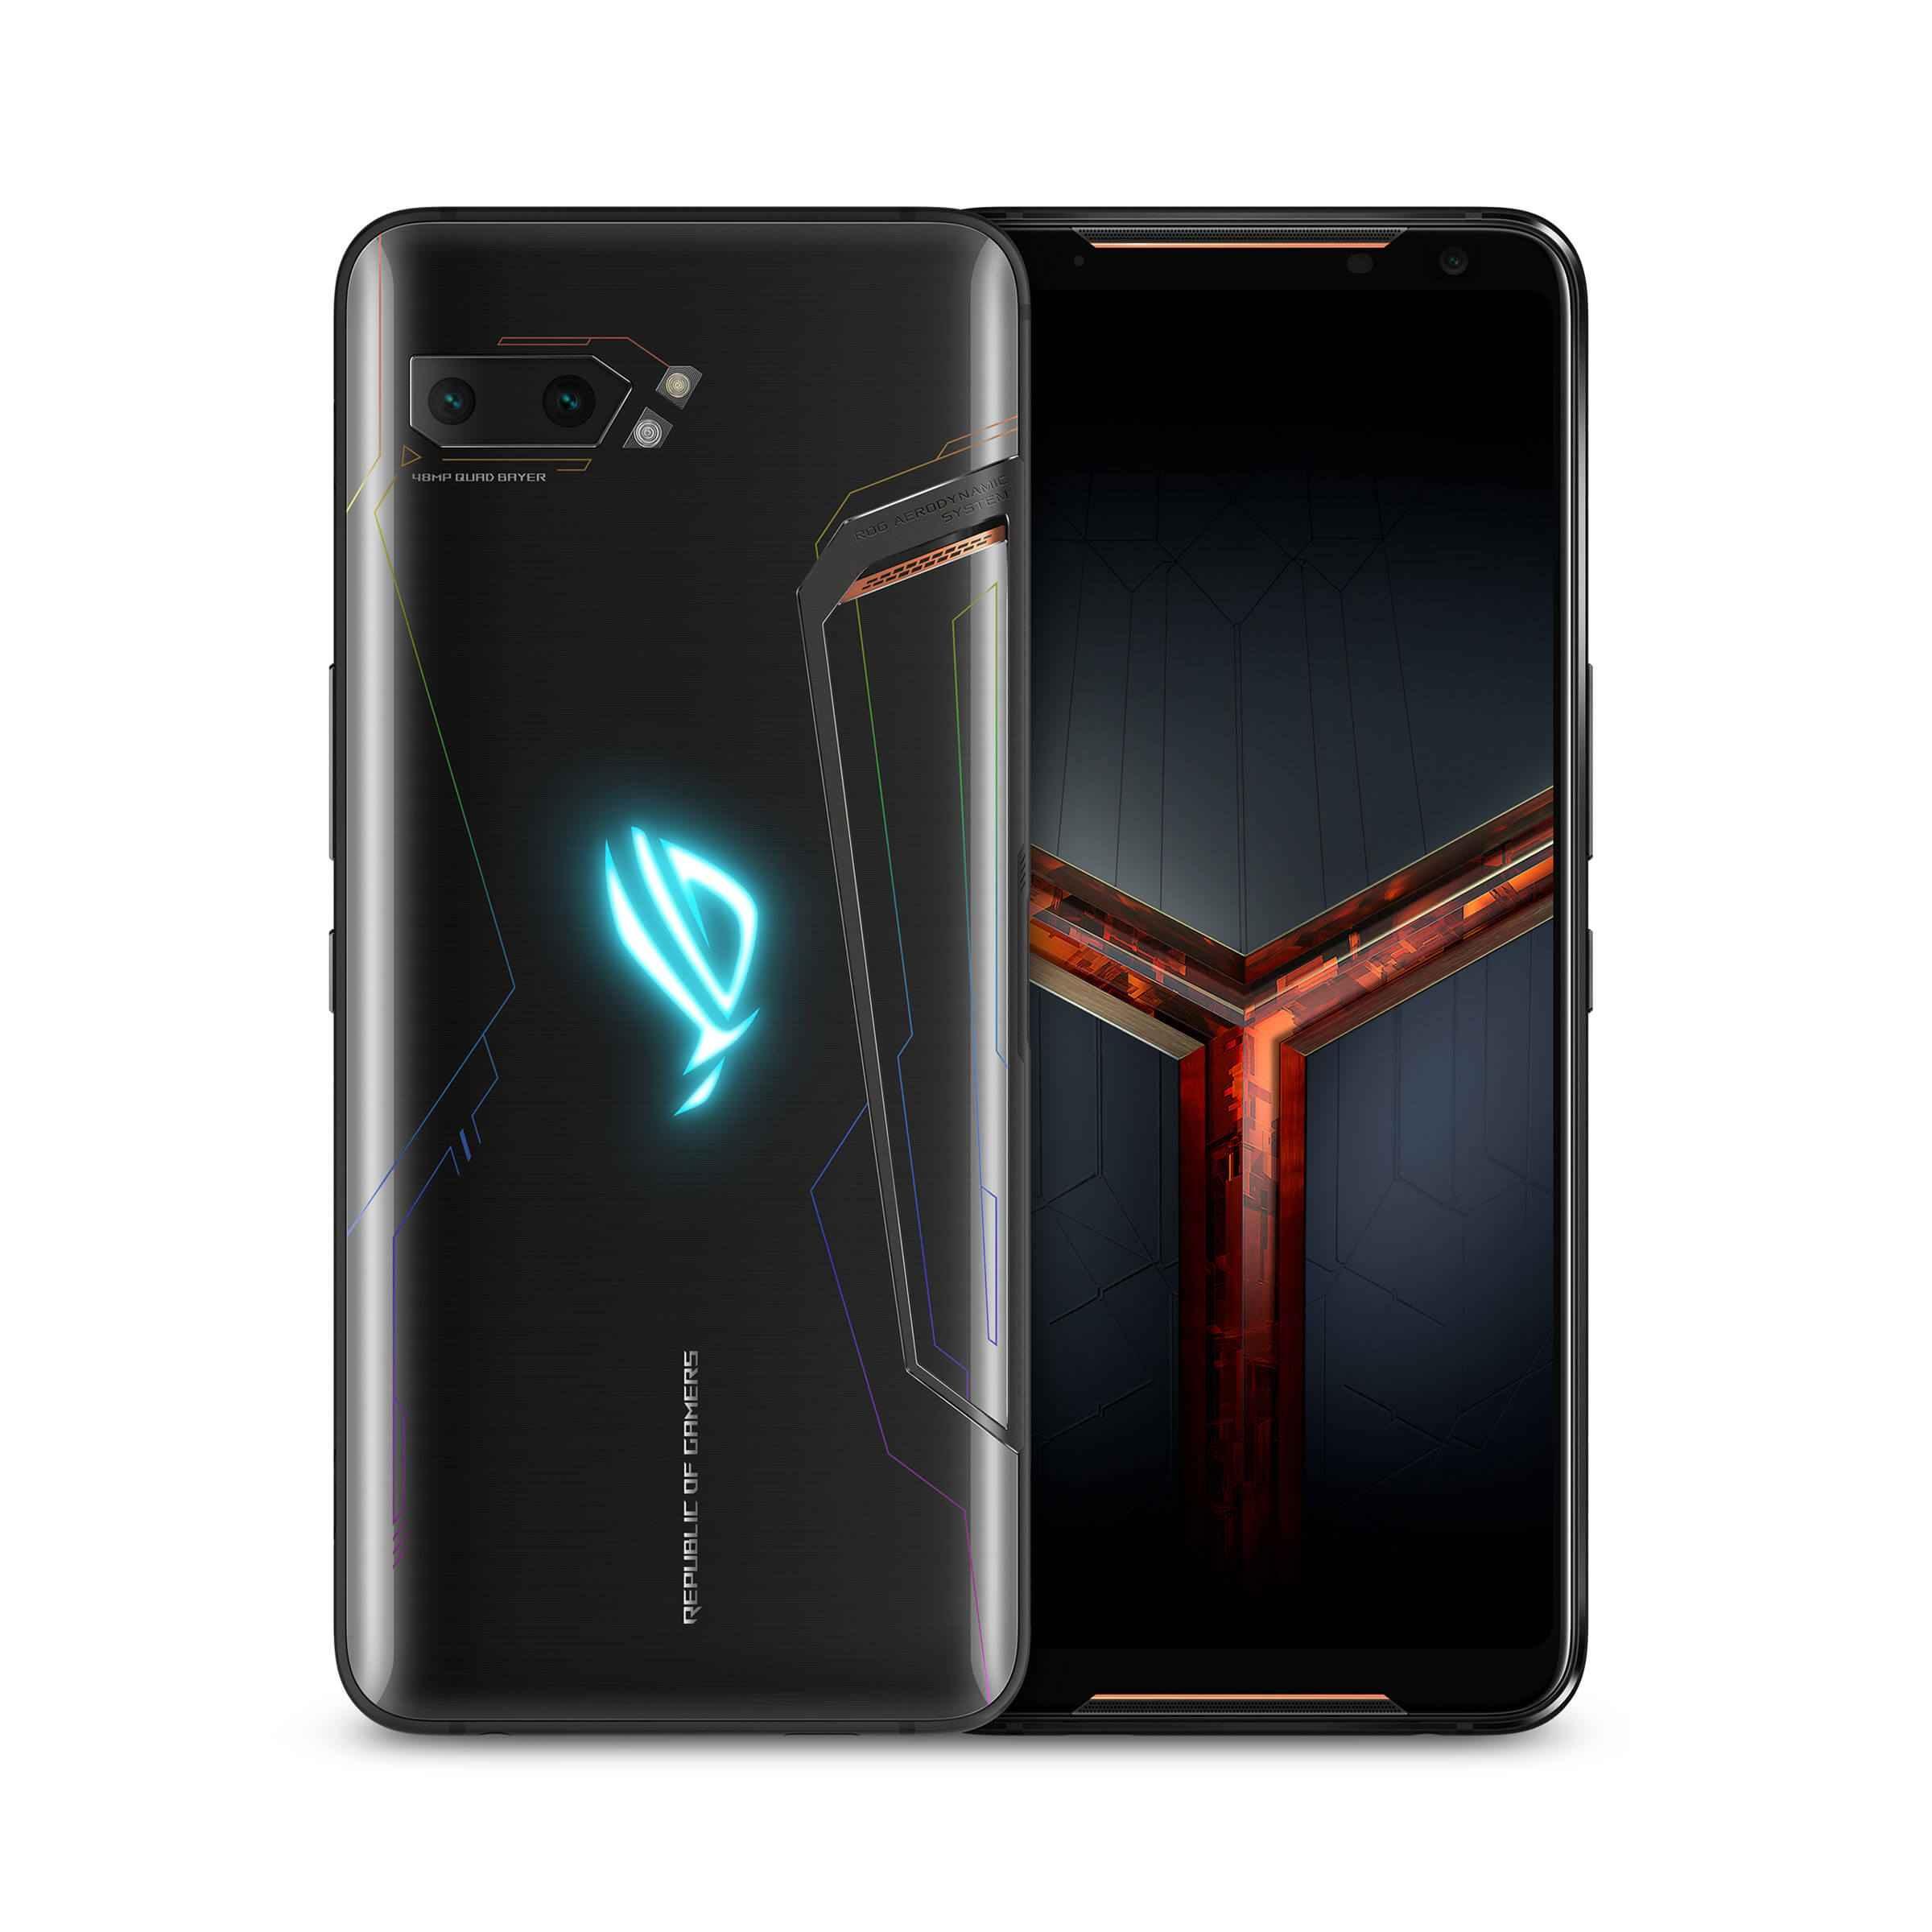 ASUS ROG 2 GAMING PHONE 12GB RAM, 512GB, 4G LTE BLACK